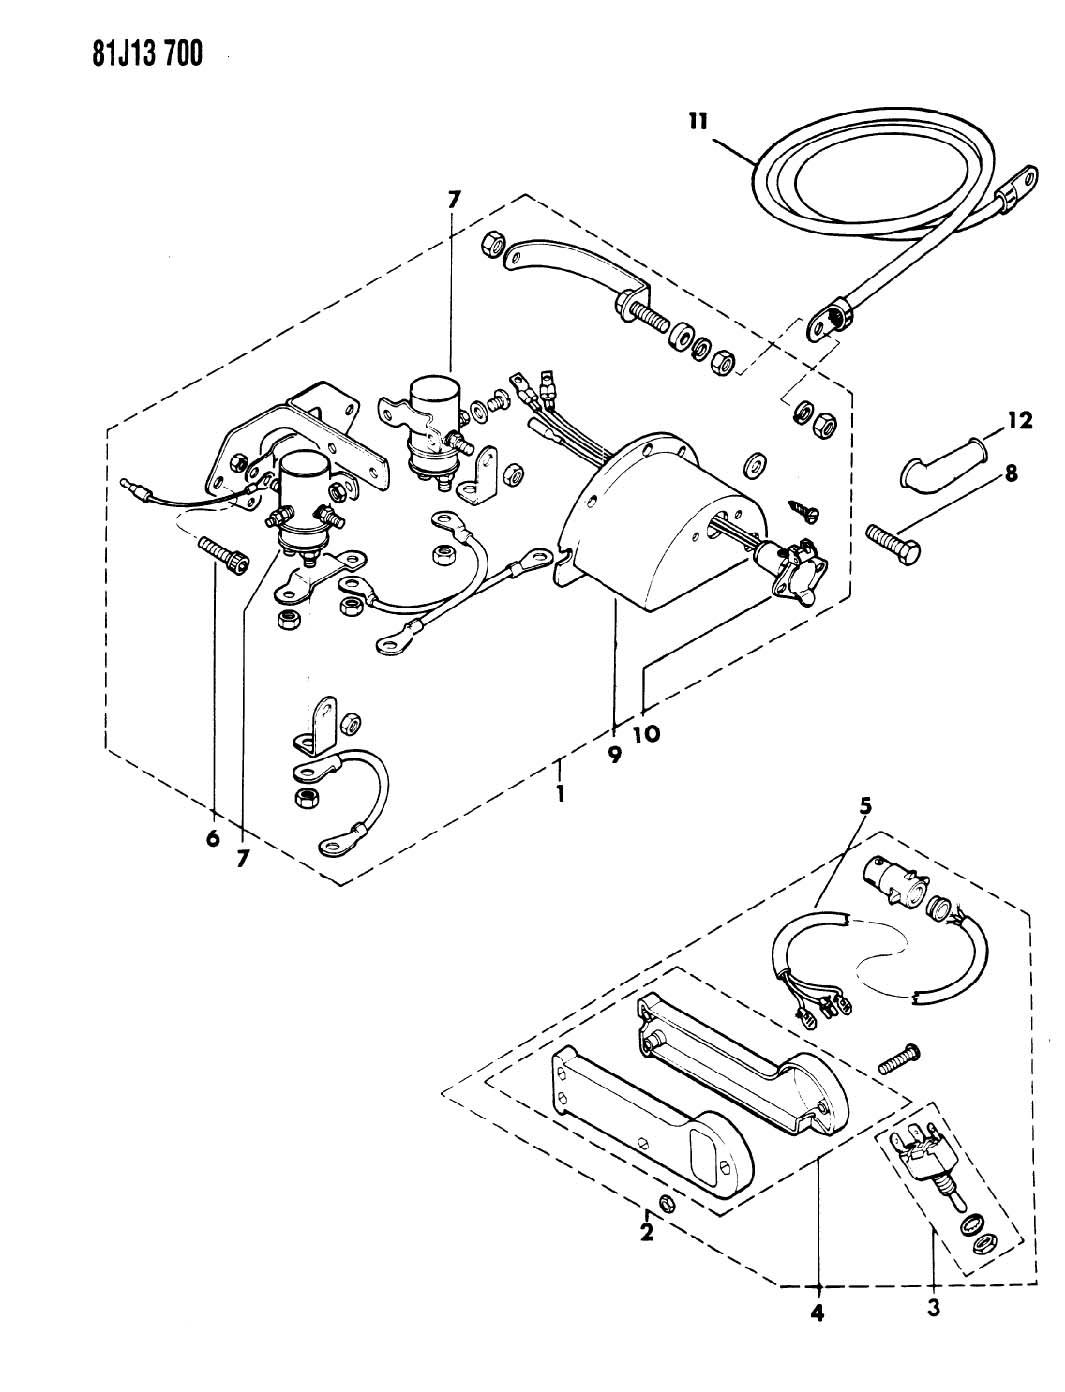 Jeep Wrangler Winch Controls Ramsey Or Or Cj Sj Cherokee Sj Wagoneer J10 J20